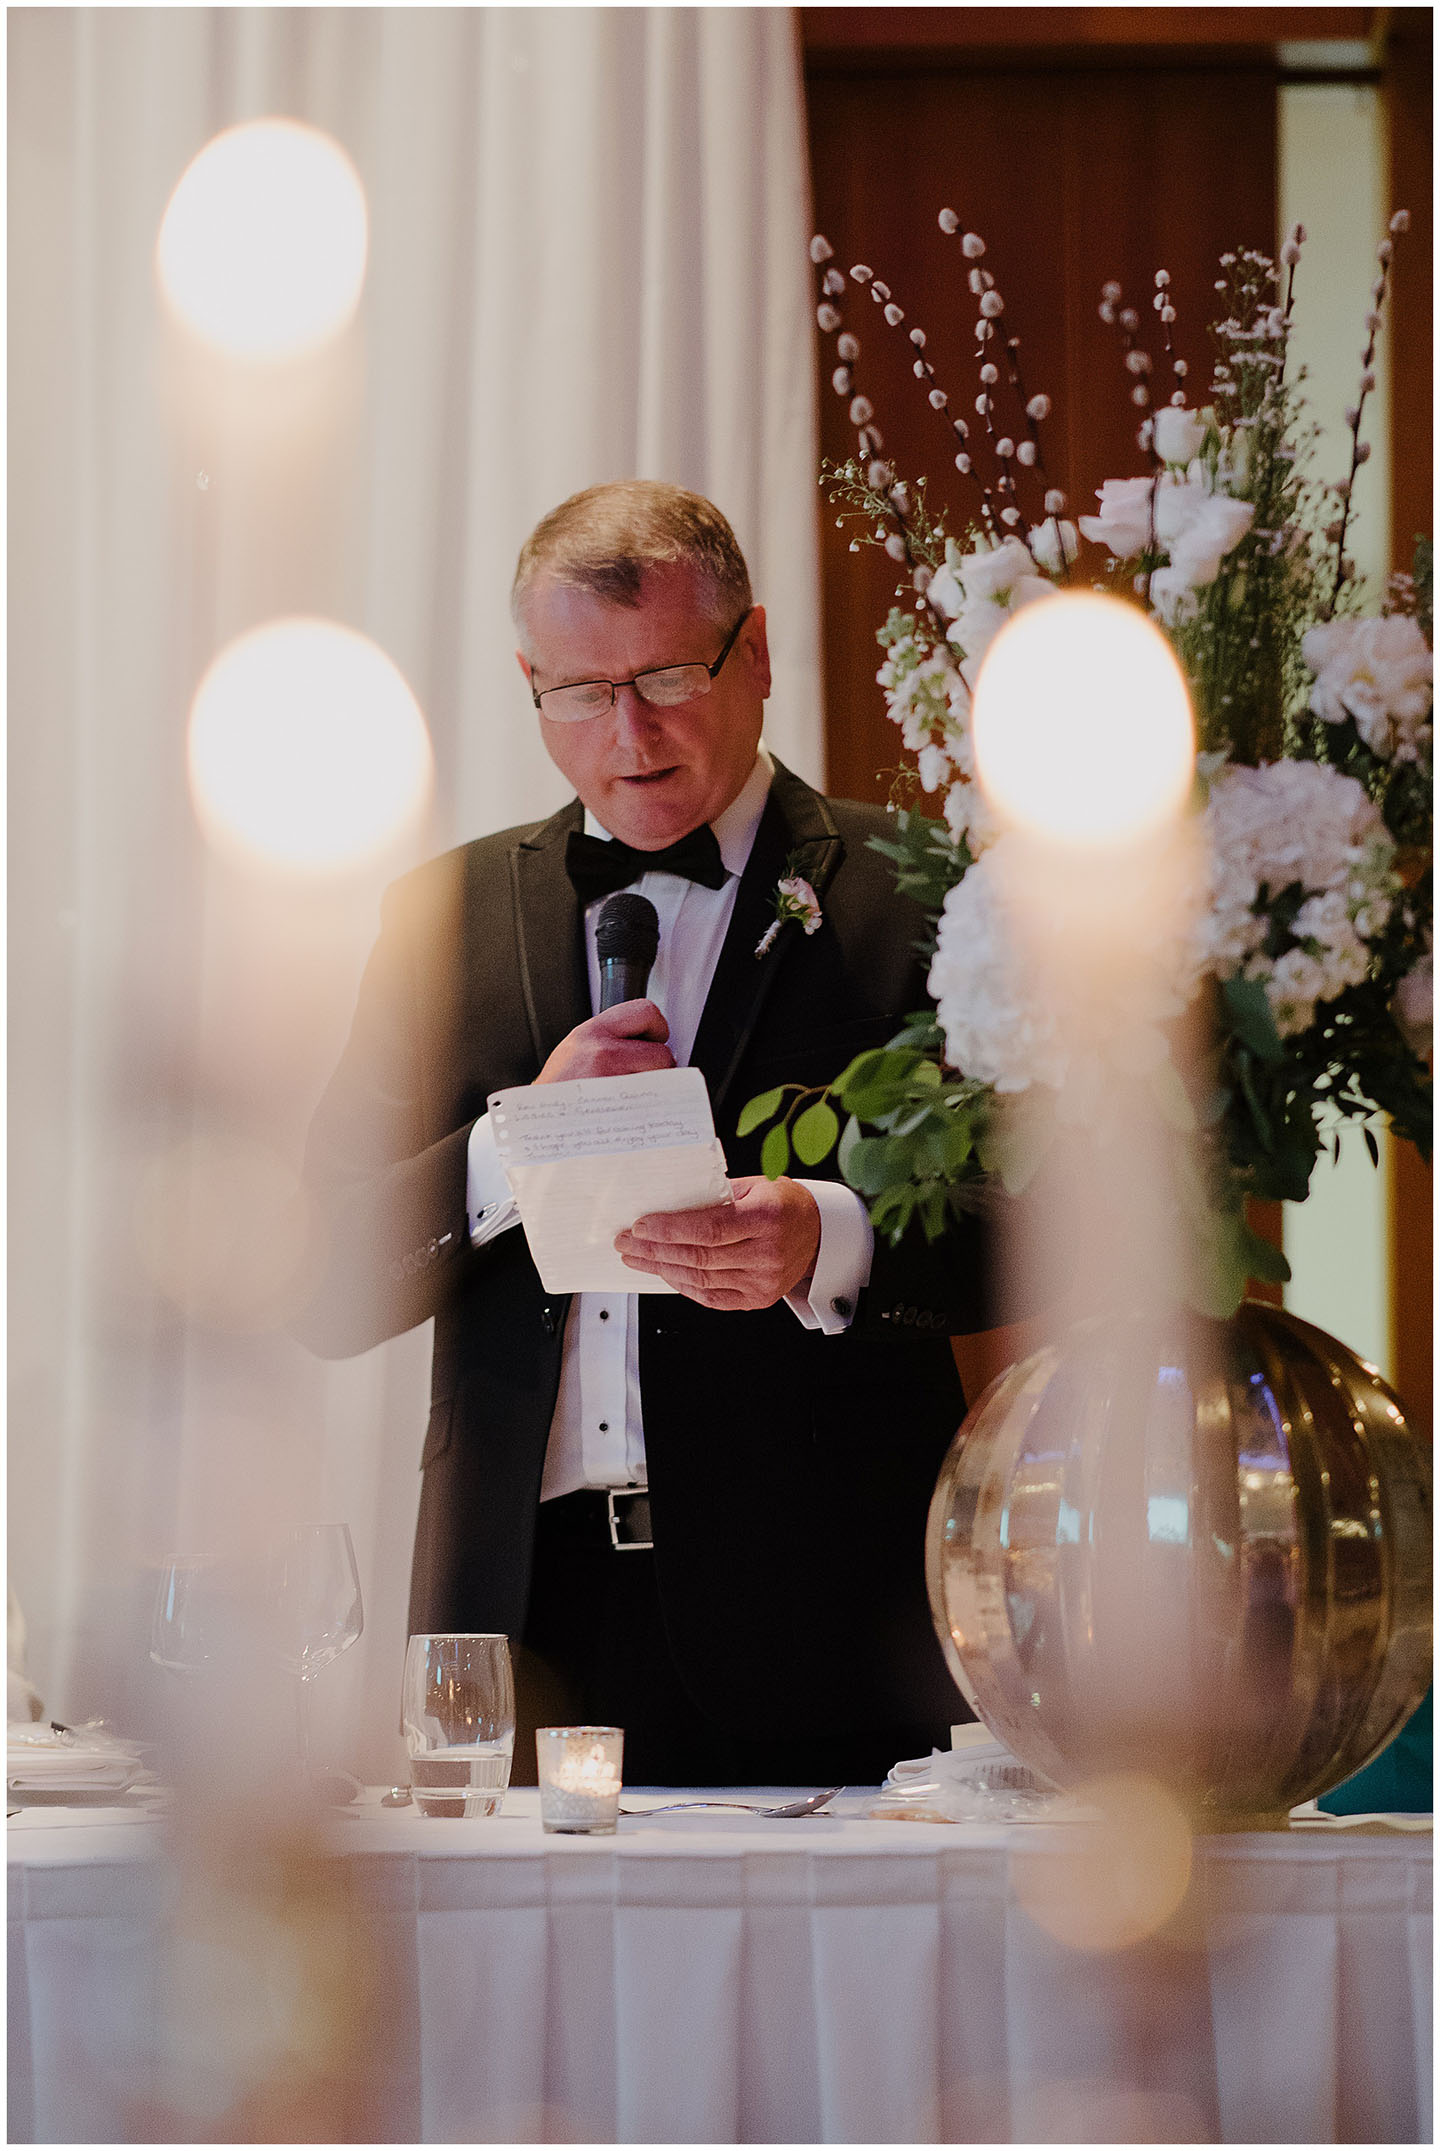 farnham-estate-wedding-jude-browne-photography_0171.jpg